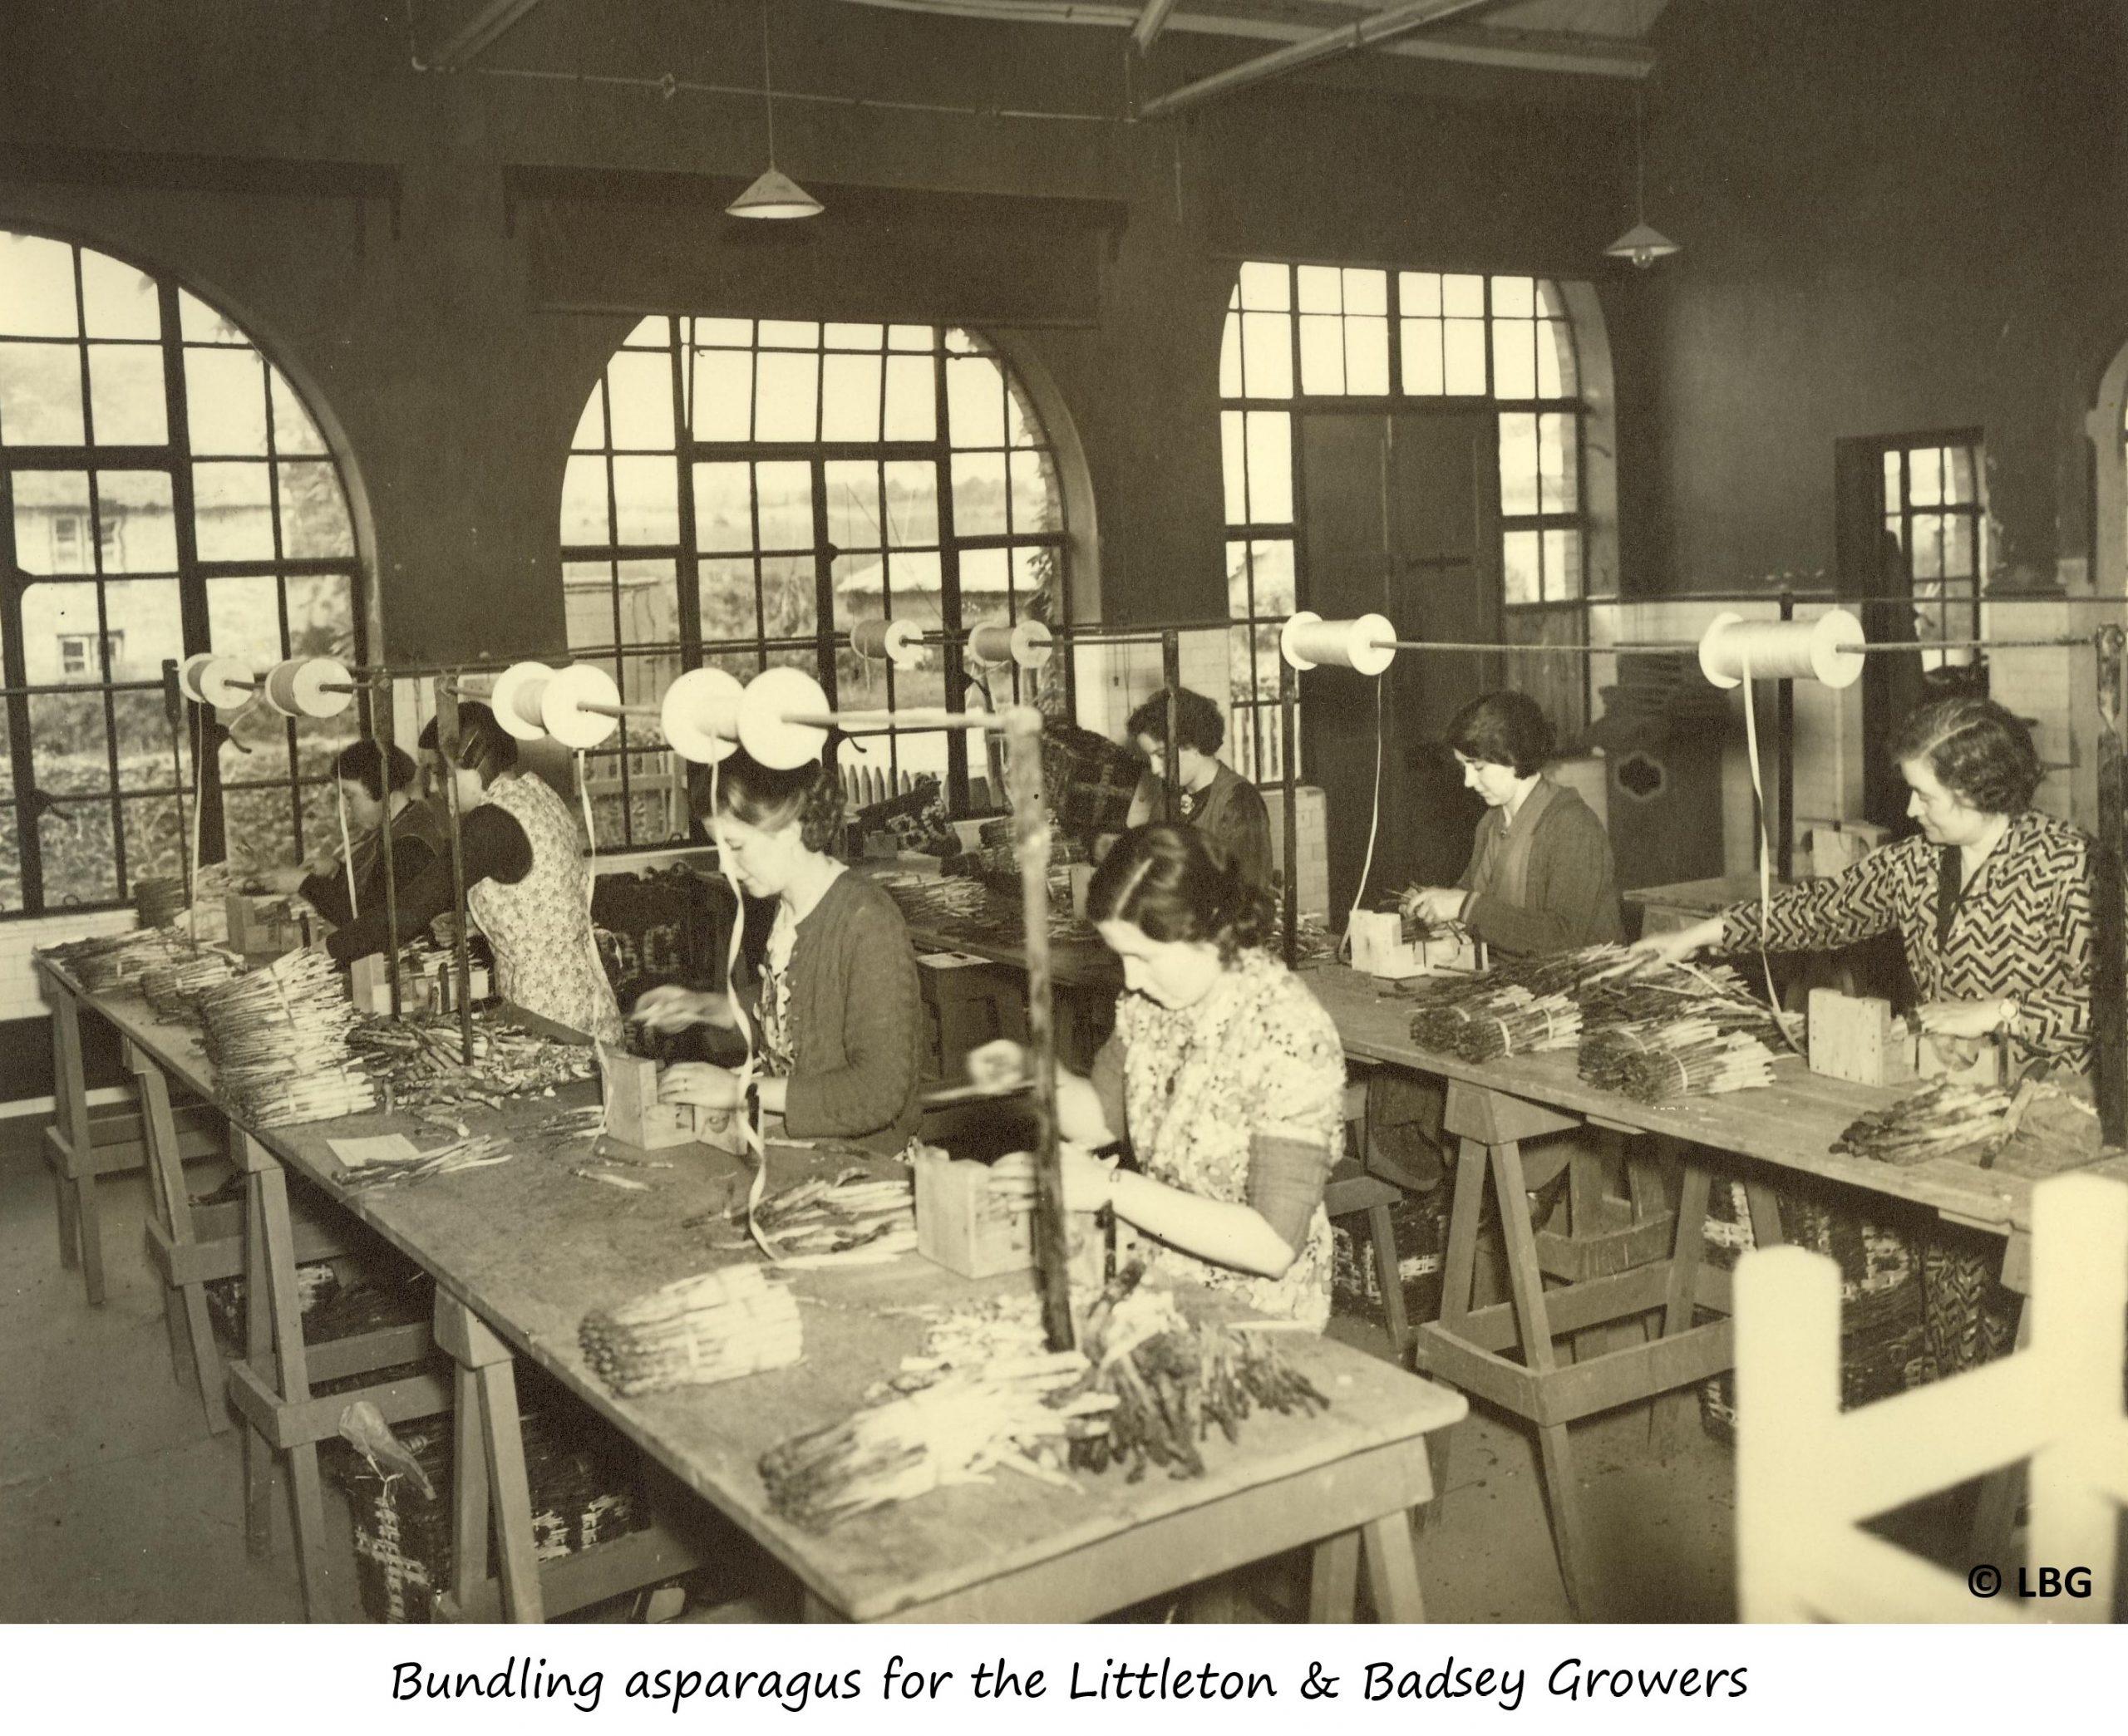 Women bundling asparagus for LBG